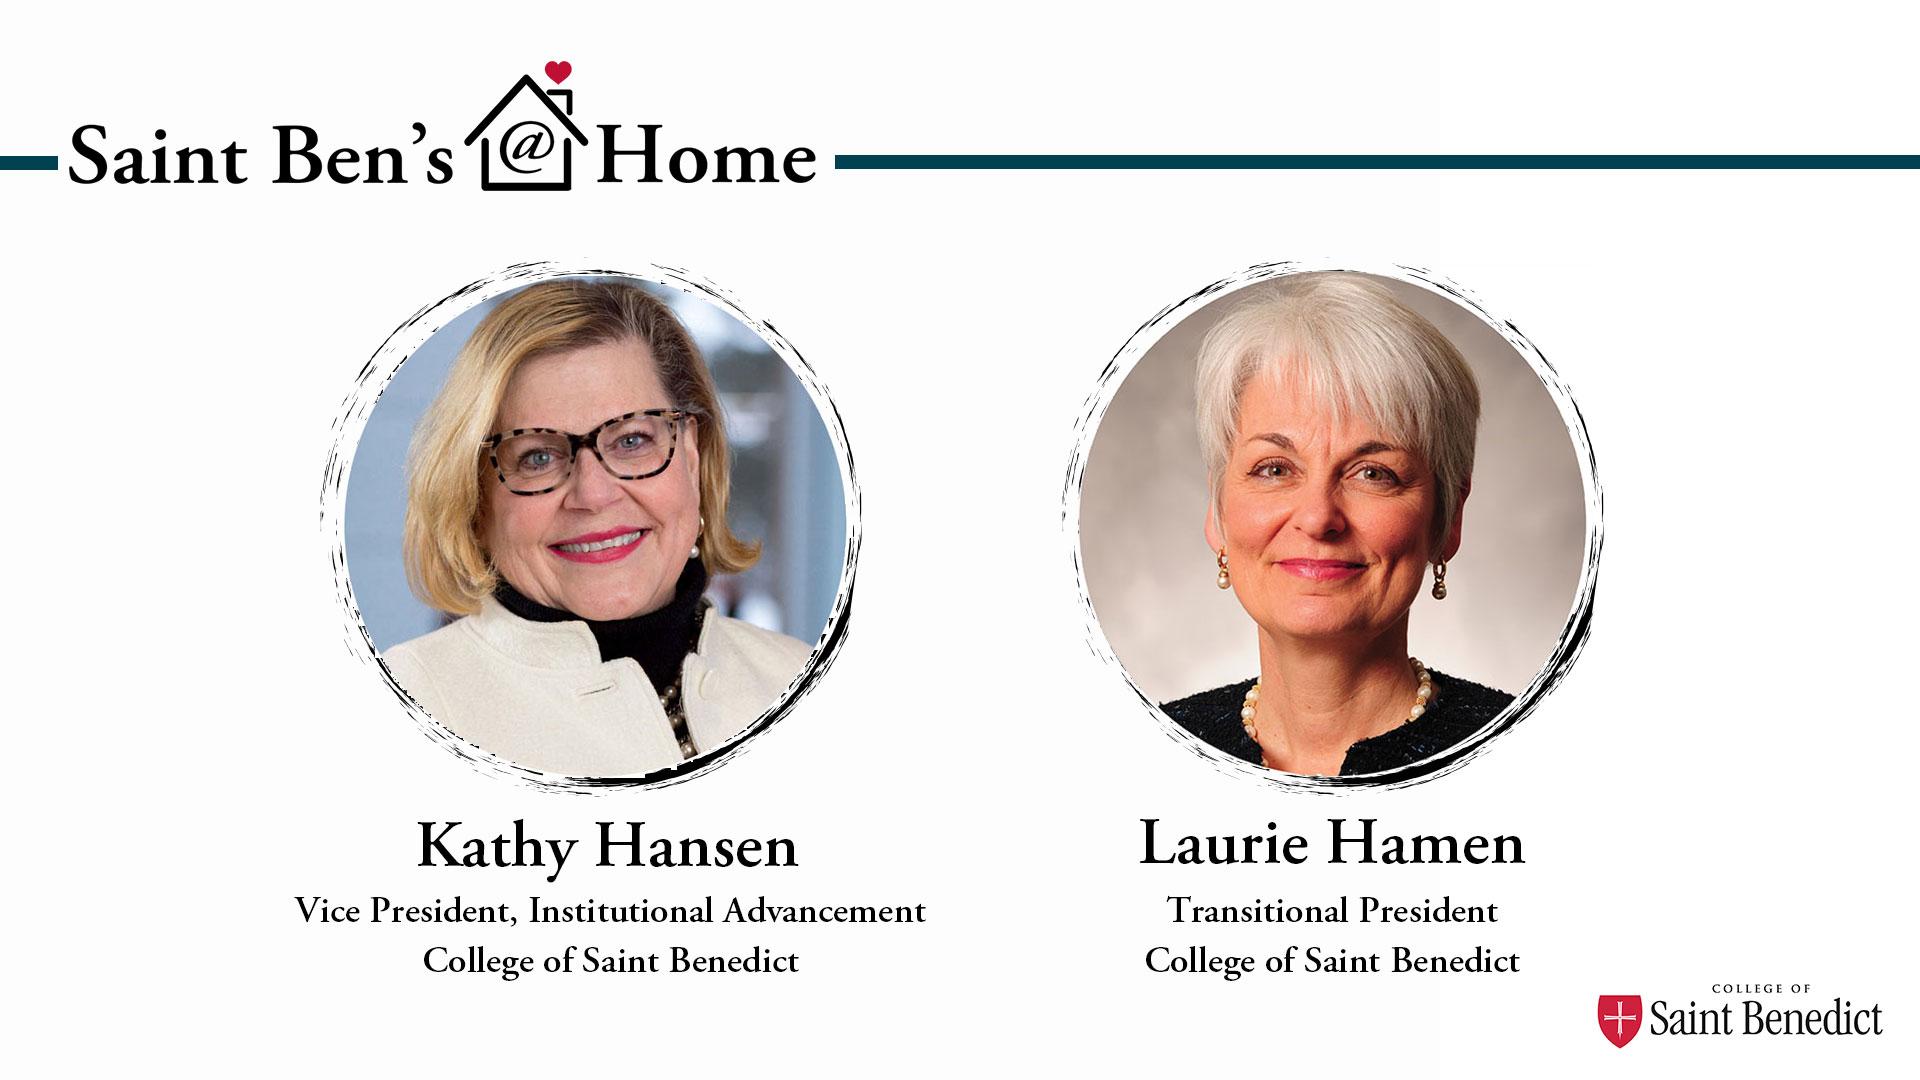 Image for Saint Ben's @ Home: Laurie Hamen's Fall Semester Snapshot webinar